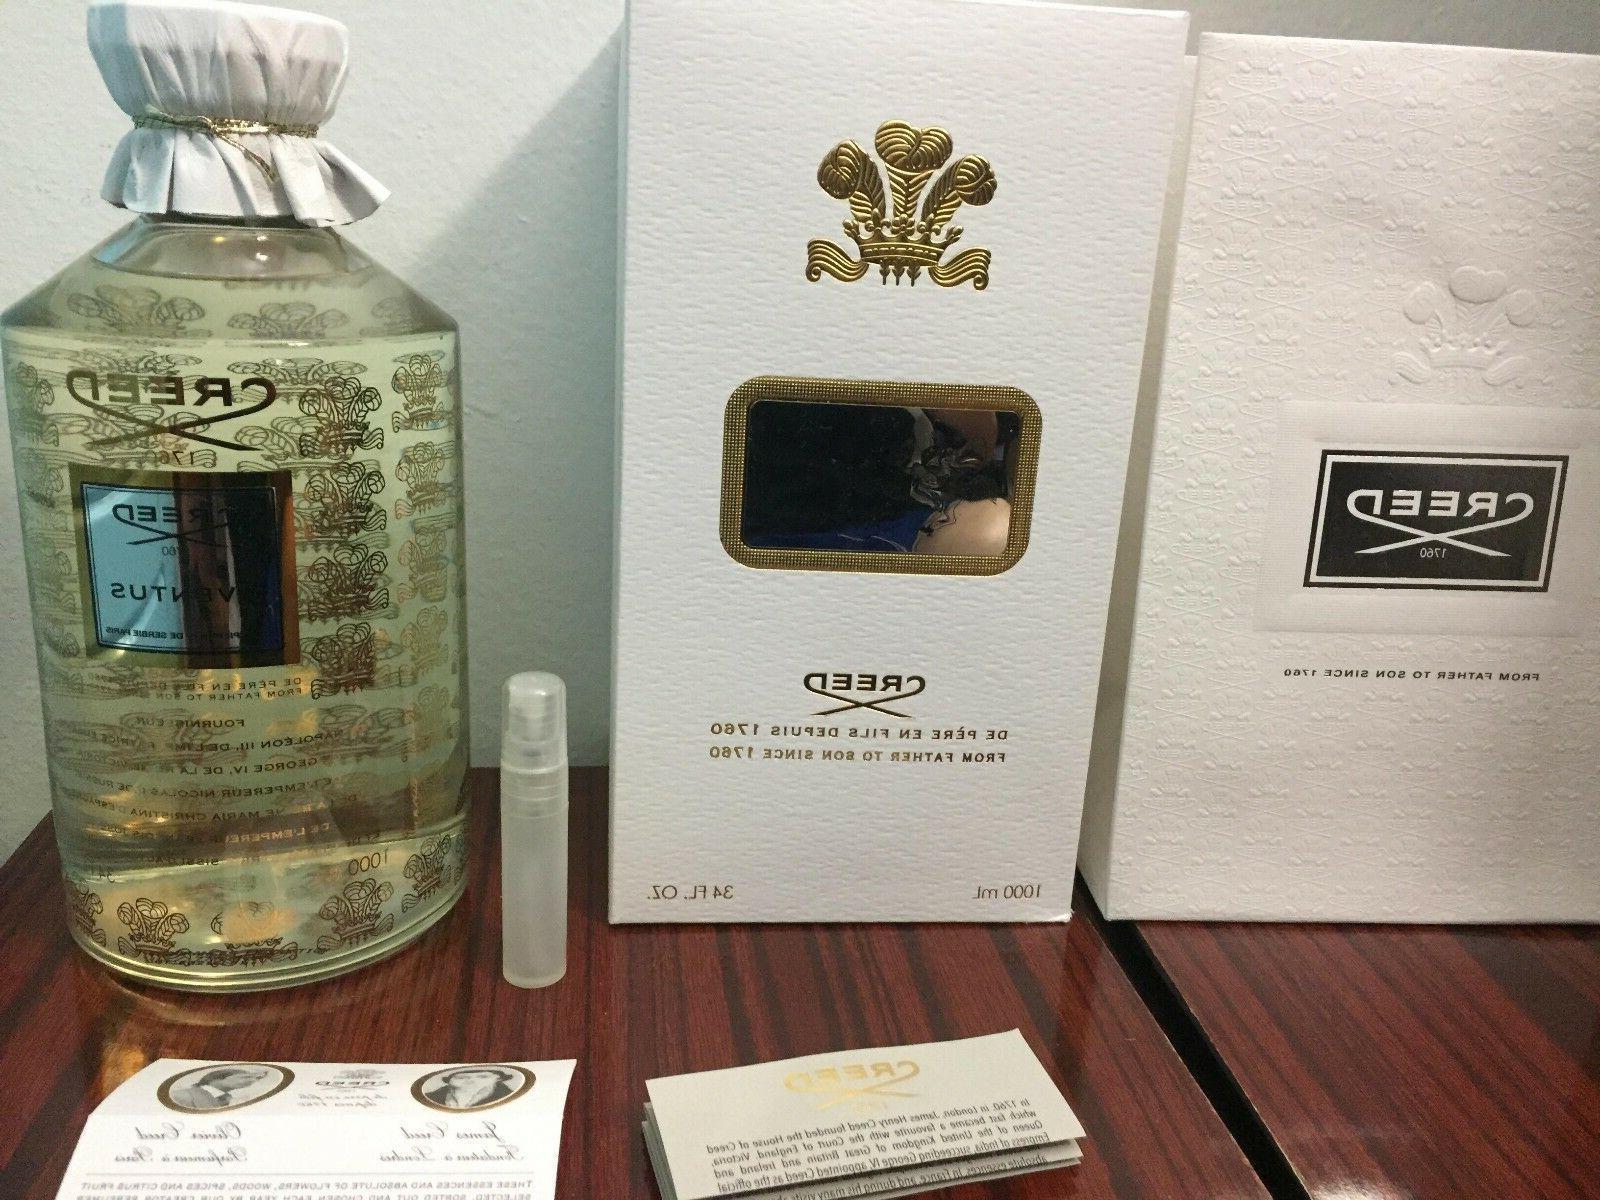 Creed Aventus men cologne 16L01 100% Authentic 5ml sample